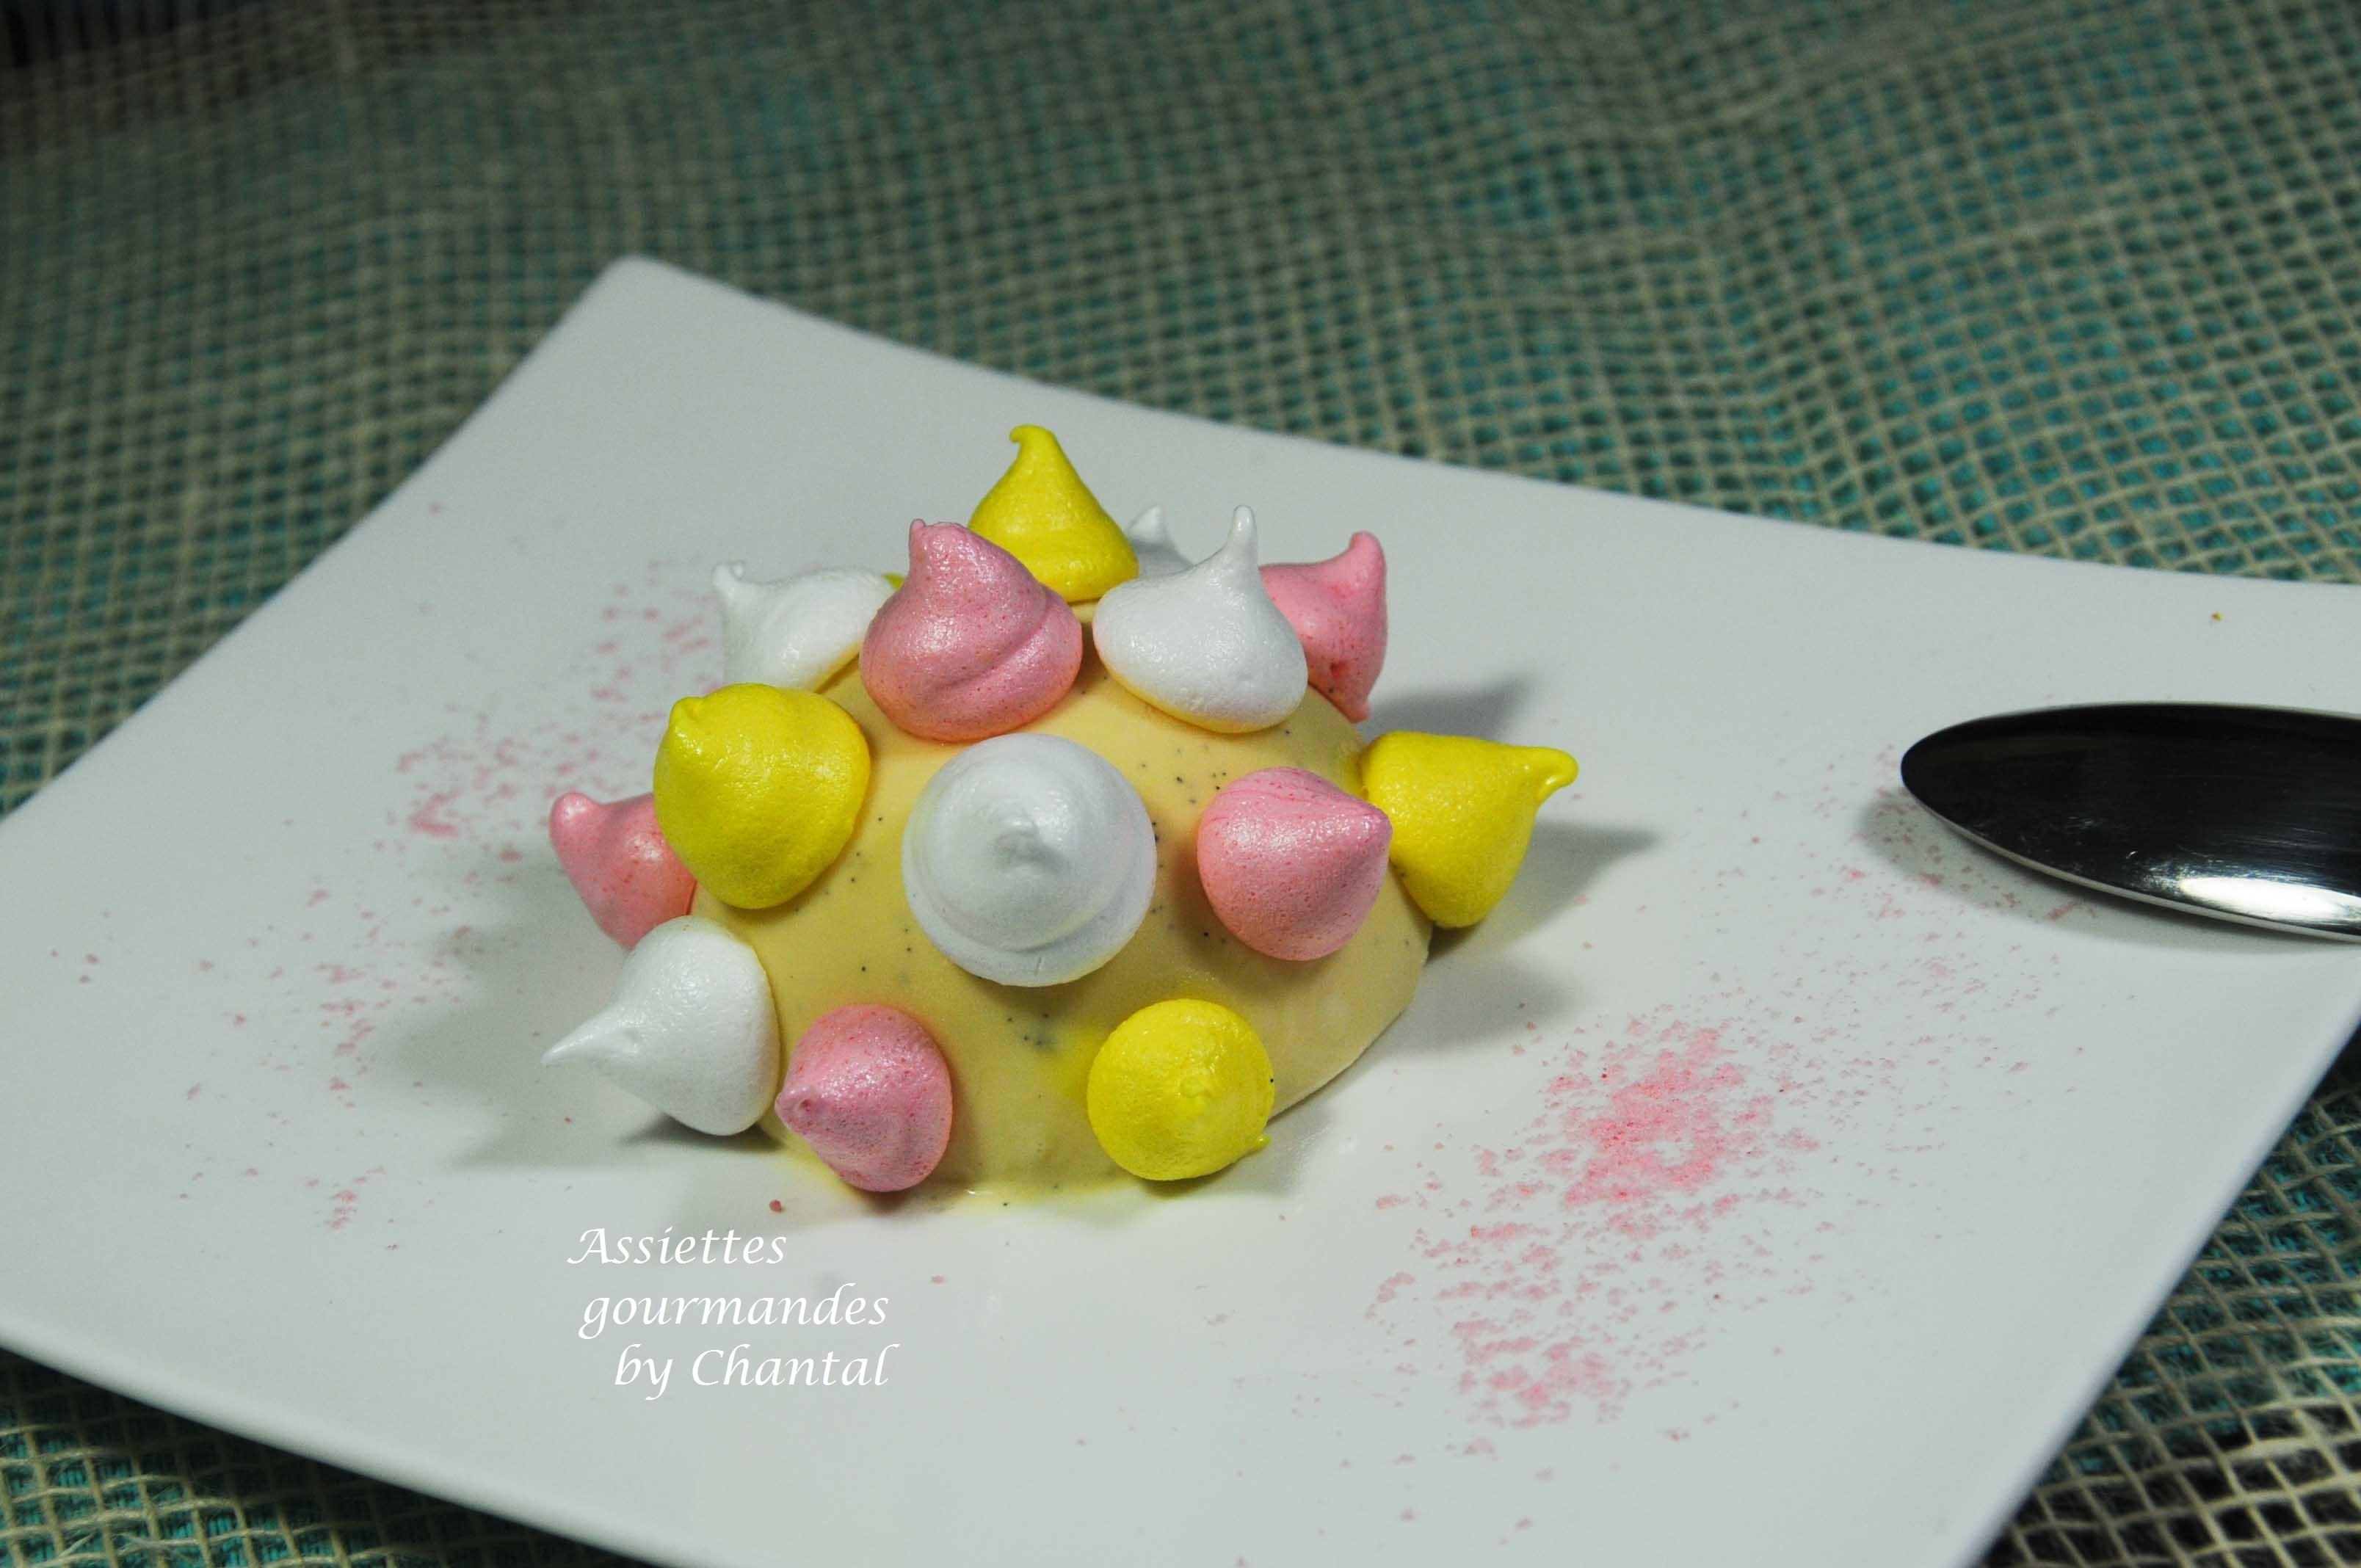 Vacherin glacé, inspiré par Christophe Michalak